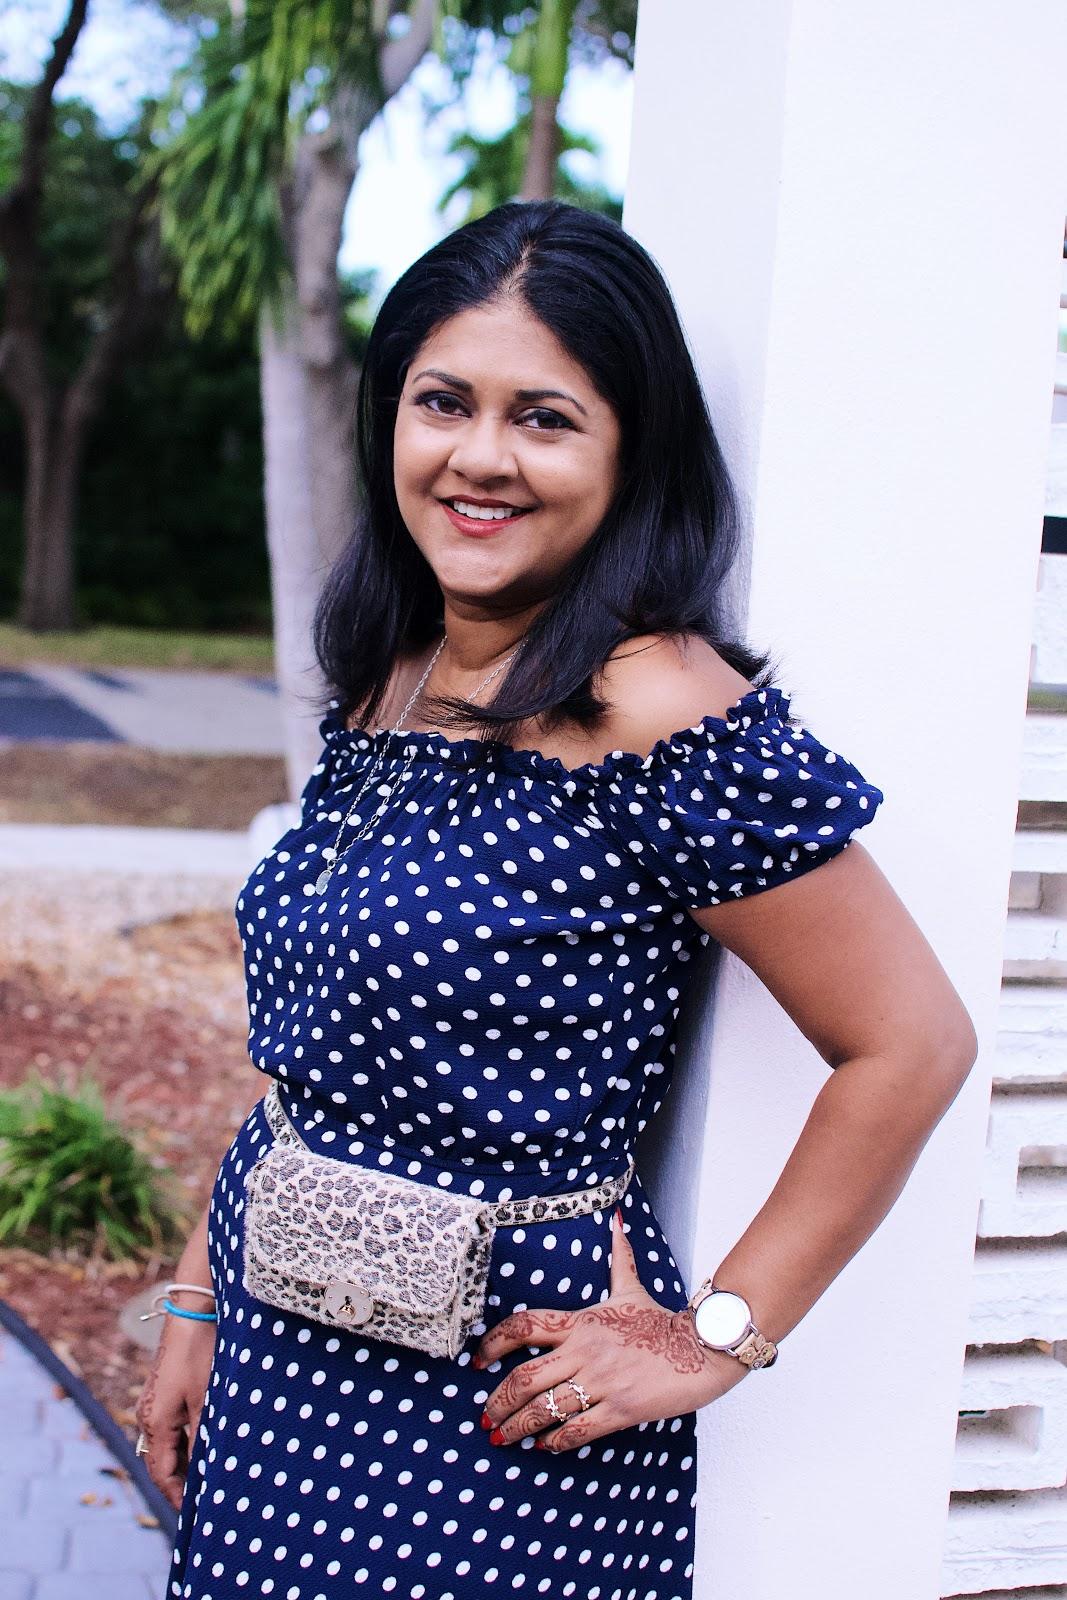 Leopard print belt bag, polka dot dress, hands free purse